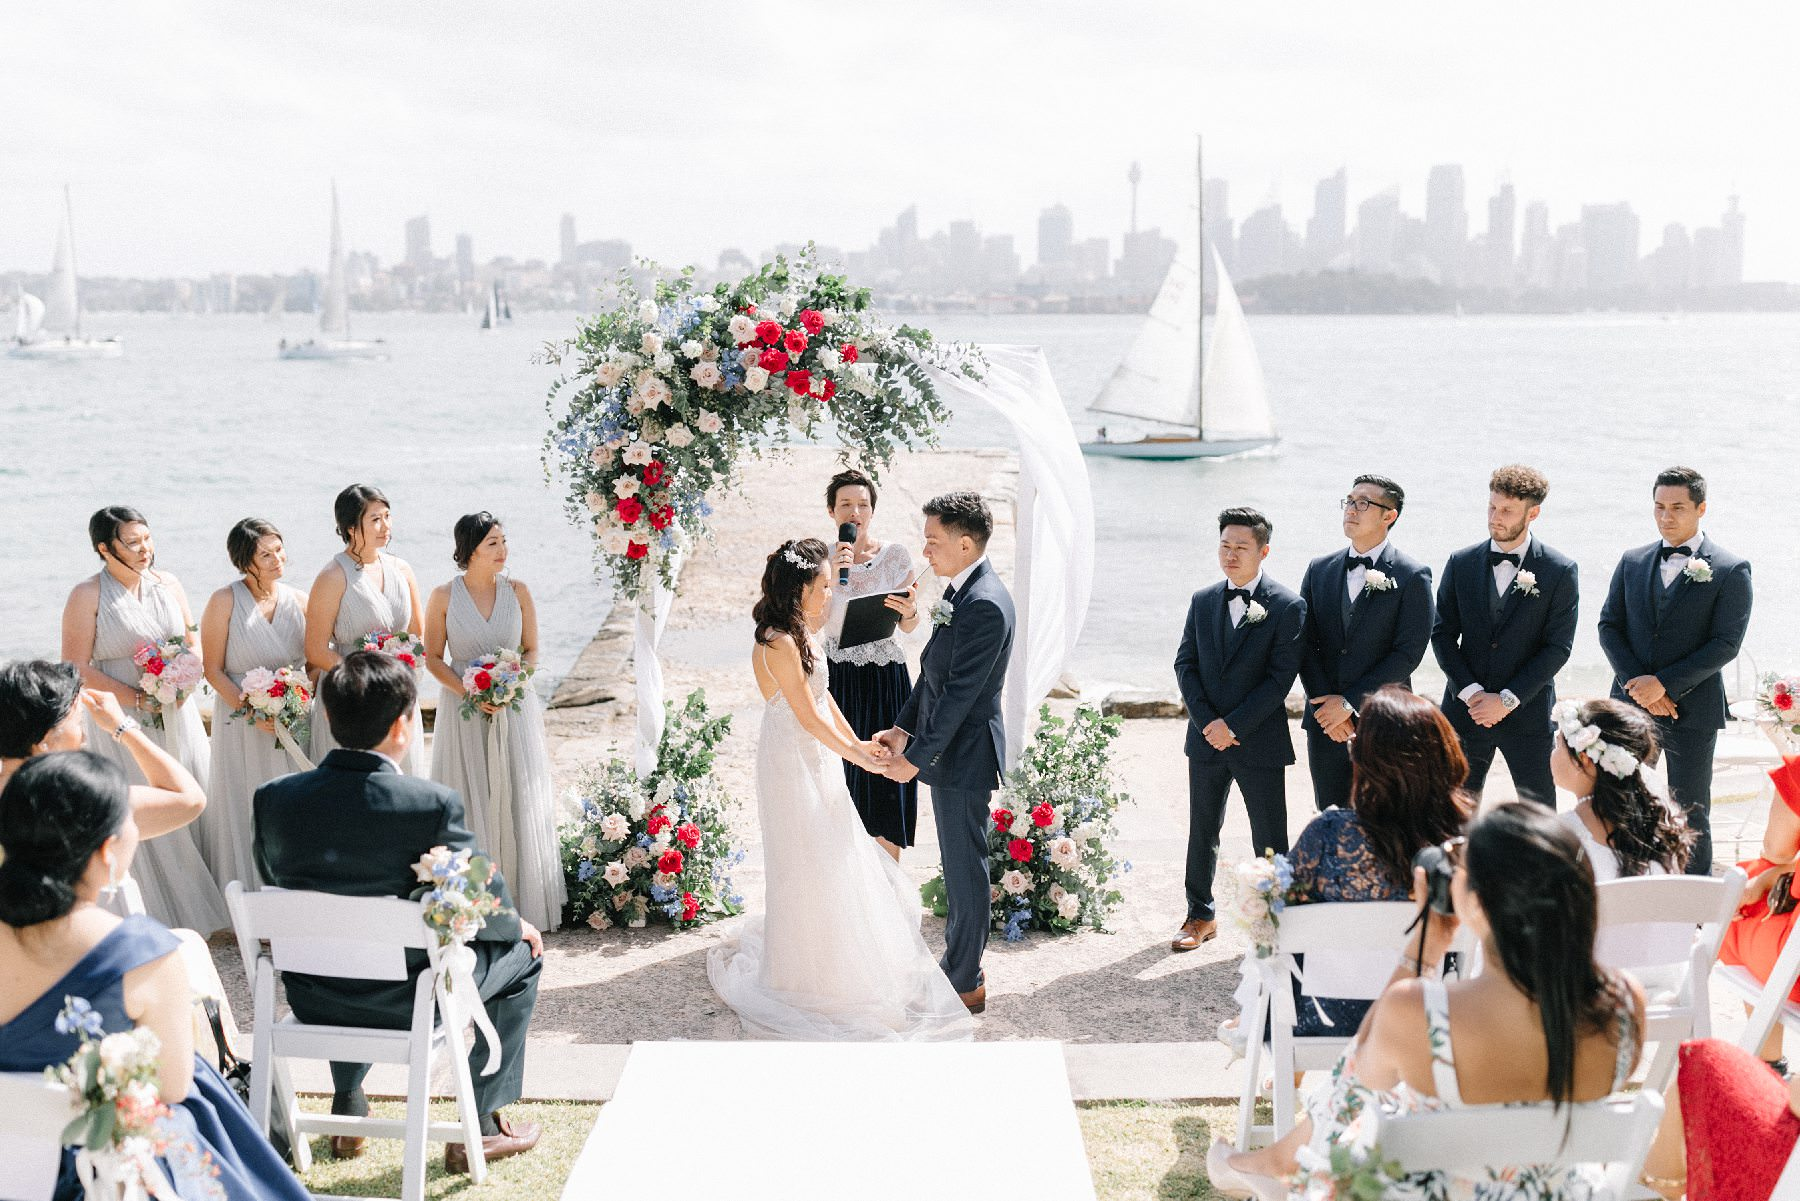 bradleys head wedding ceremony